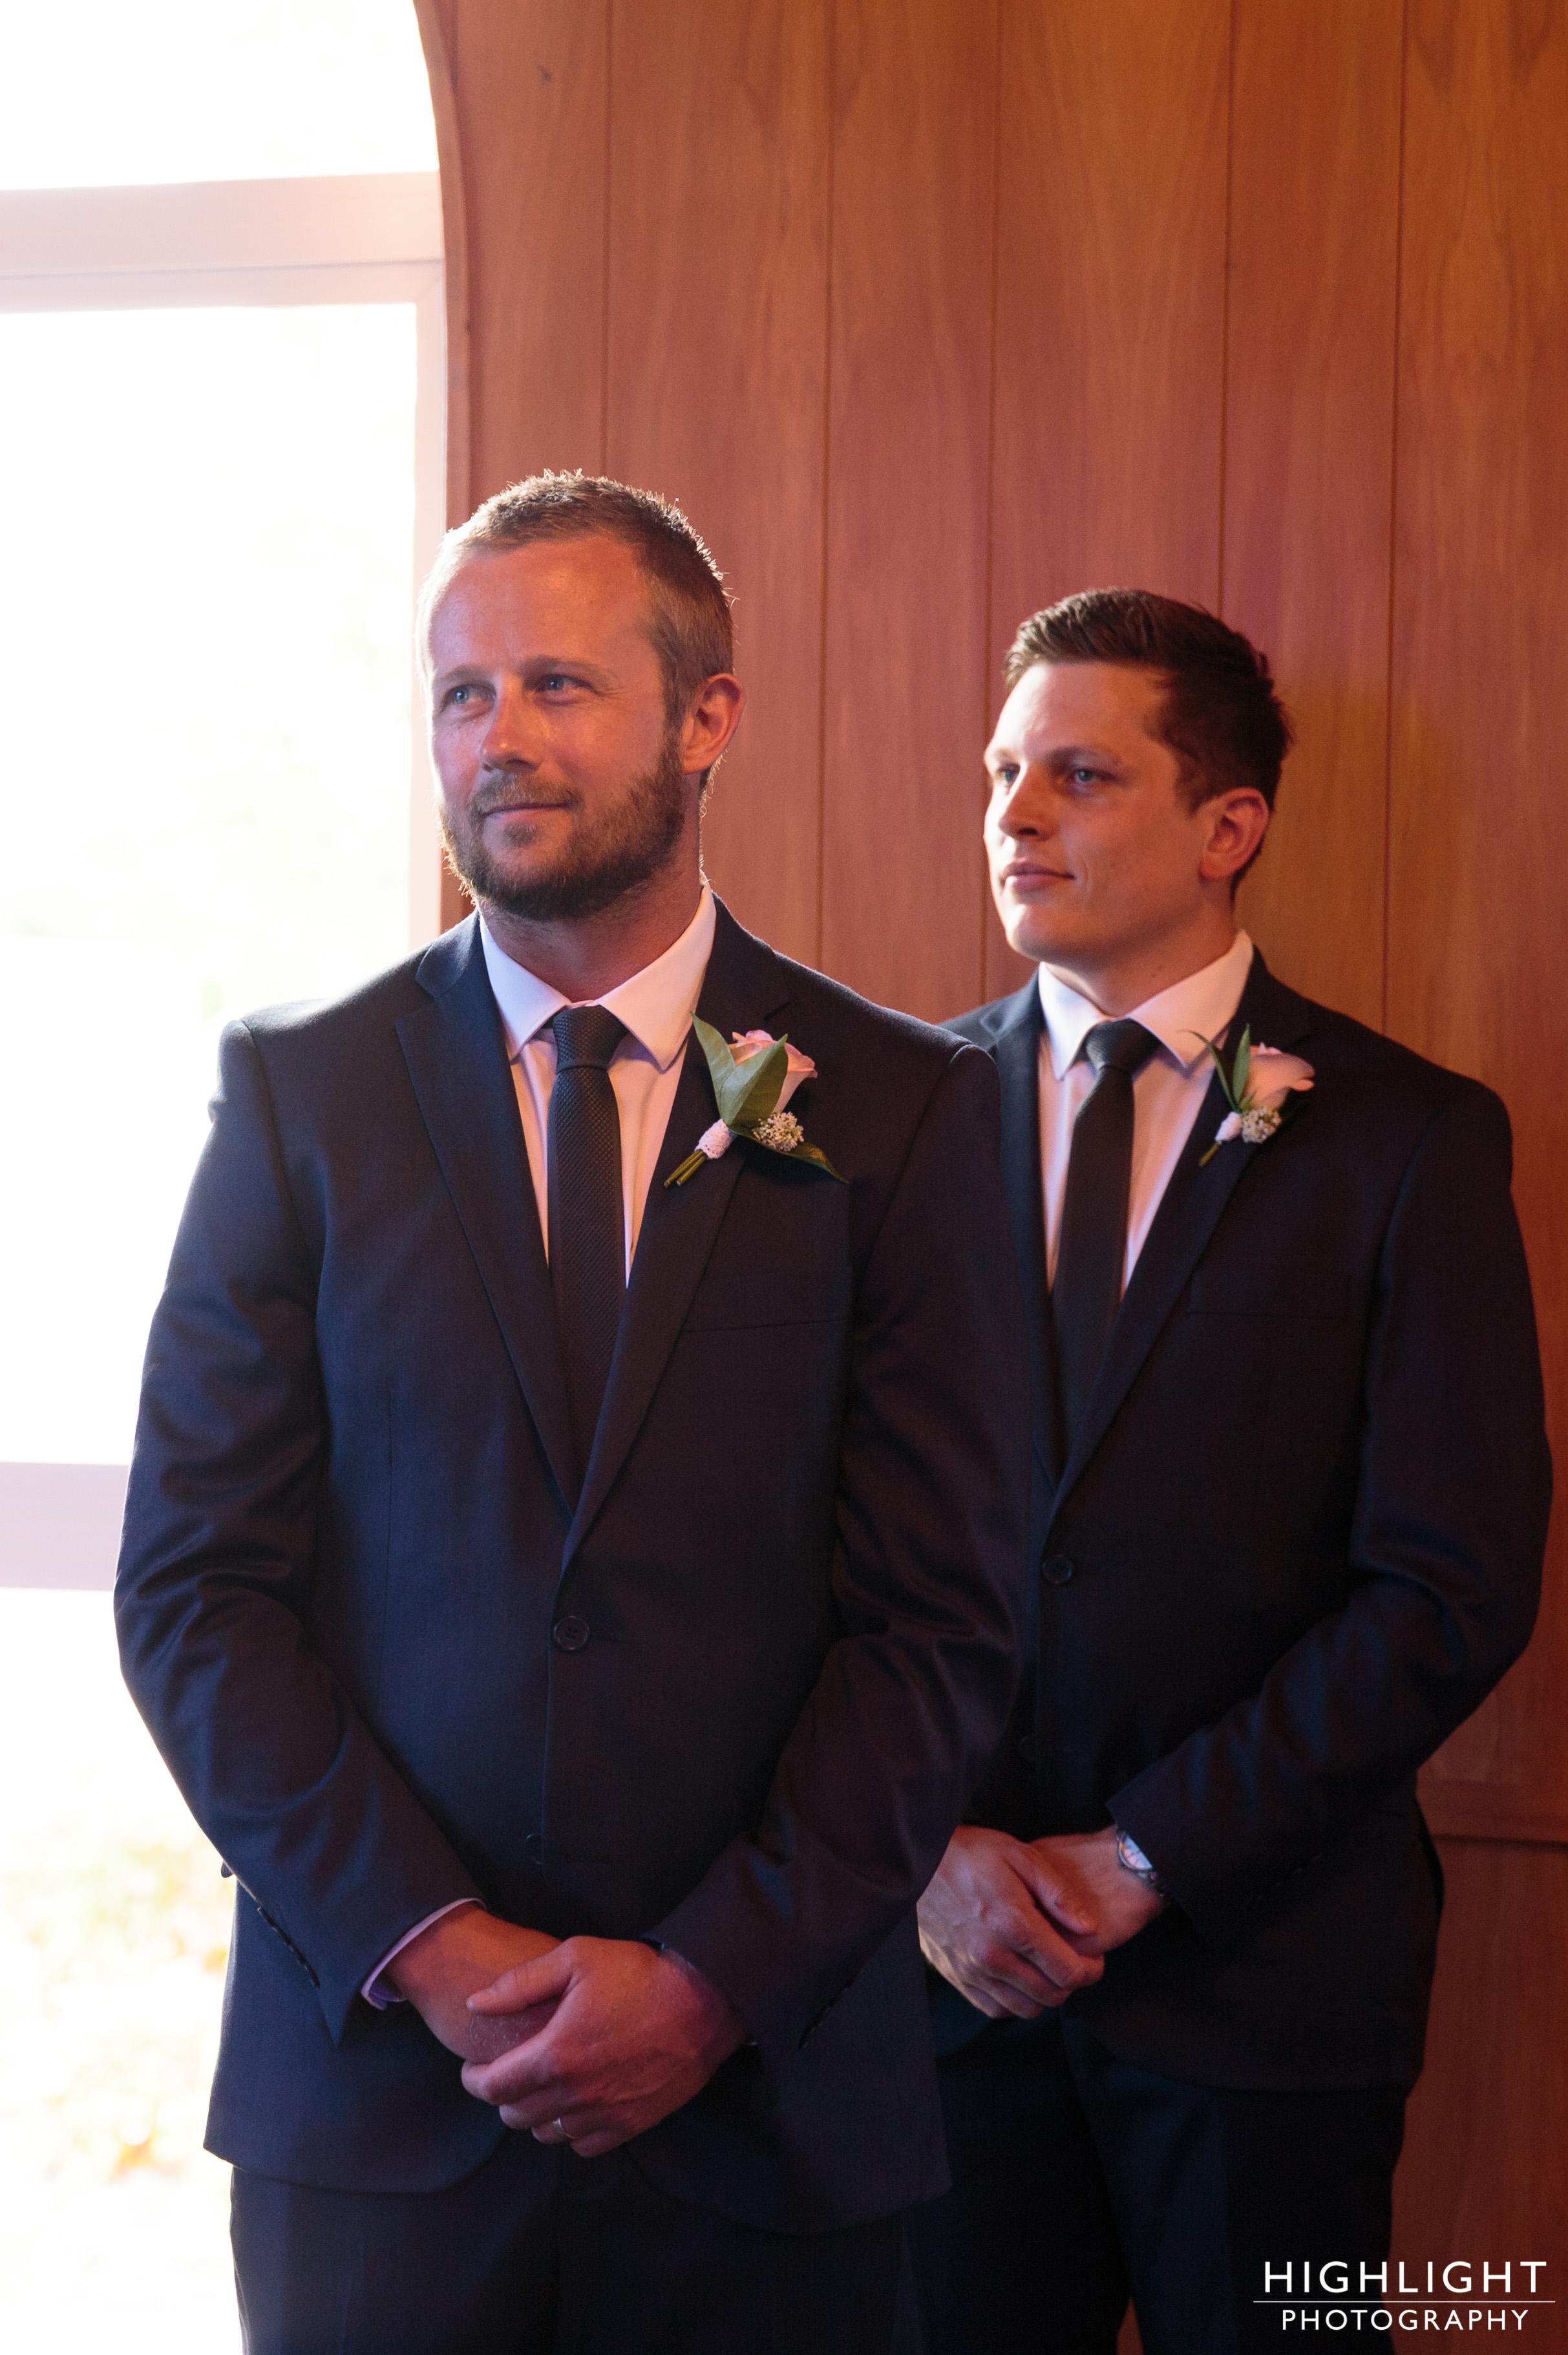 JM-2017-Highlight-wedding-photography-palmerston-north-new-zealand-55.jpg